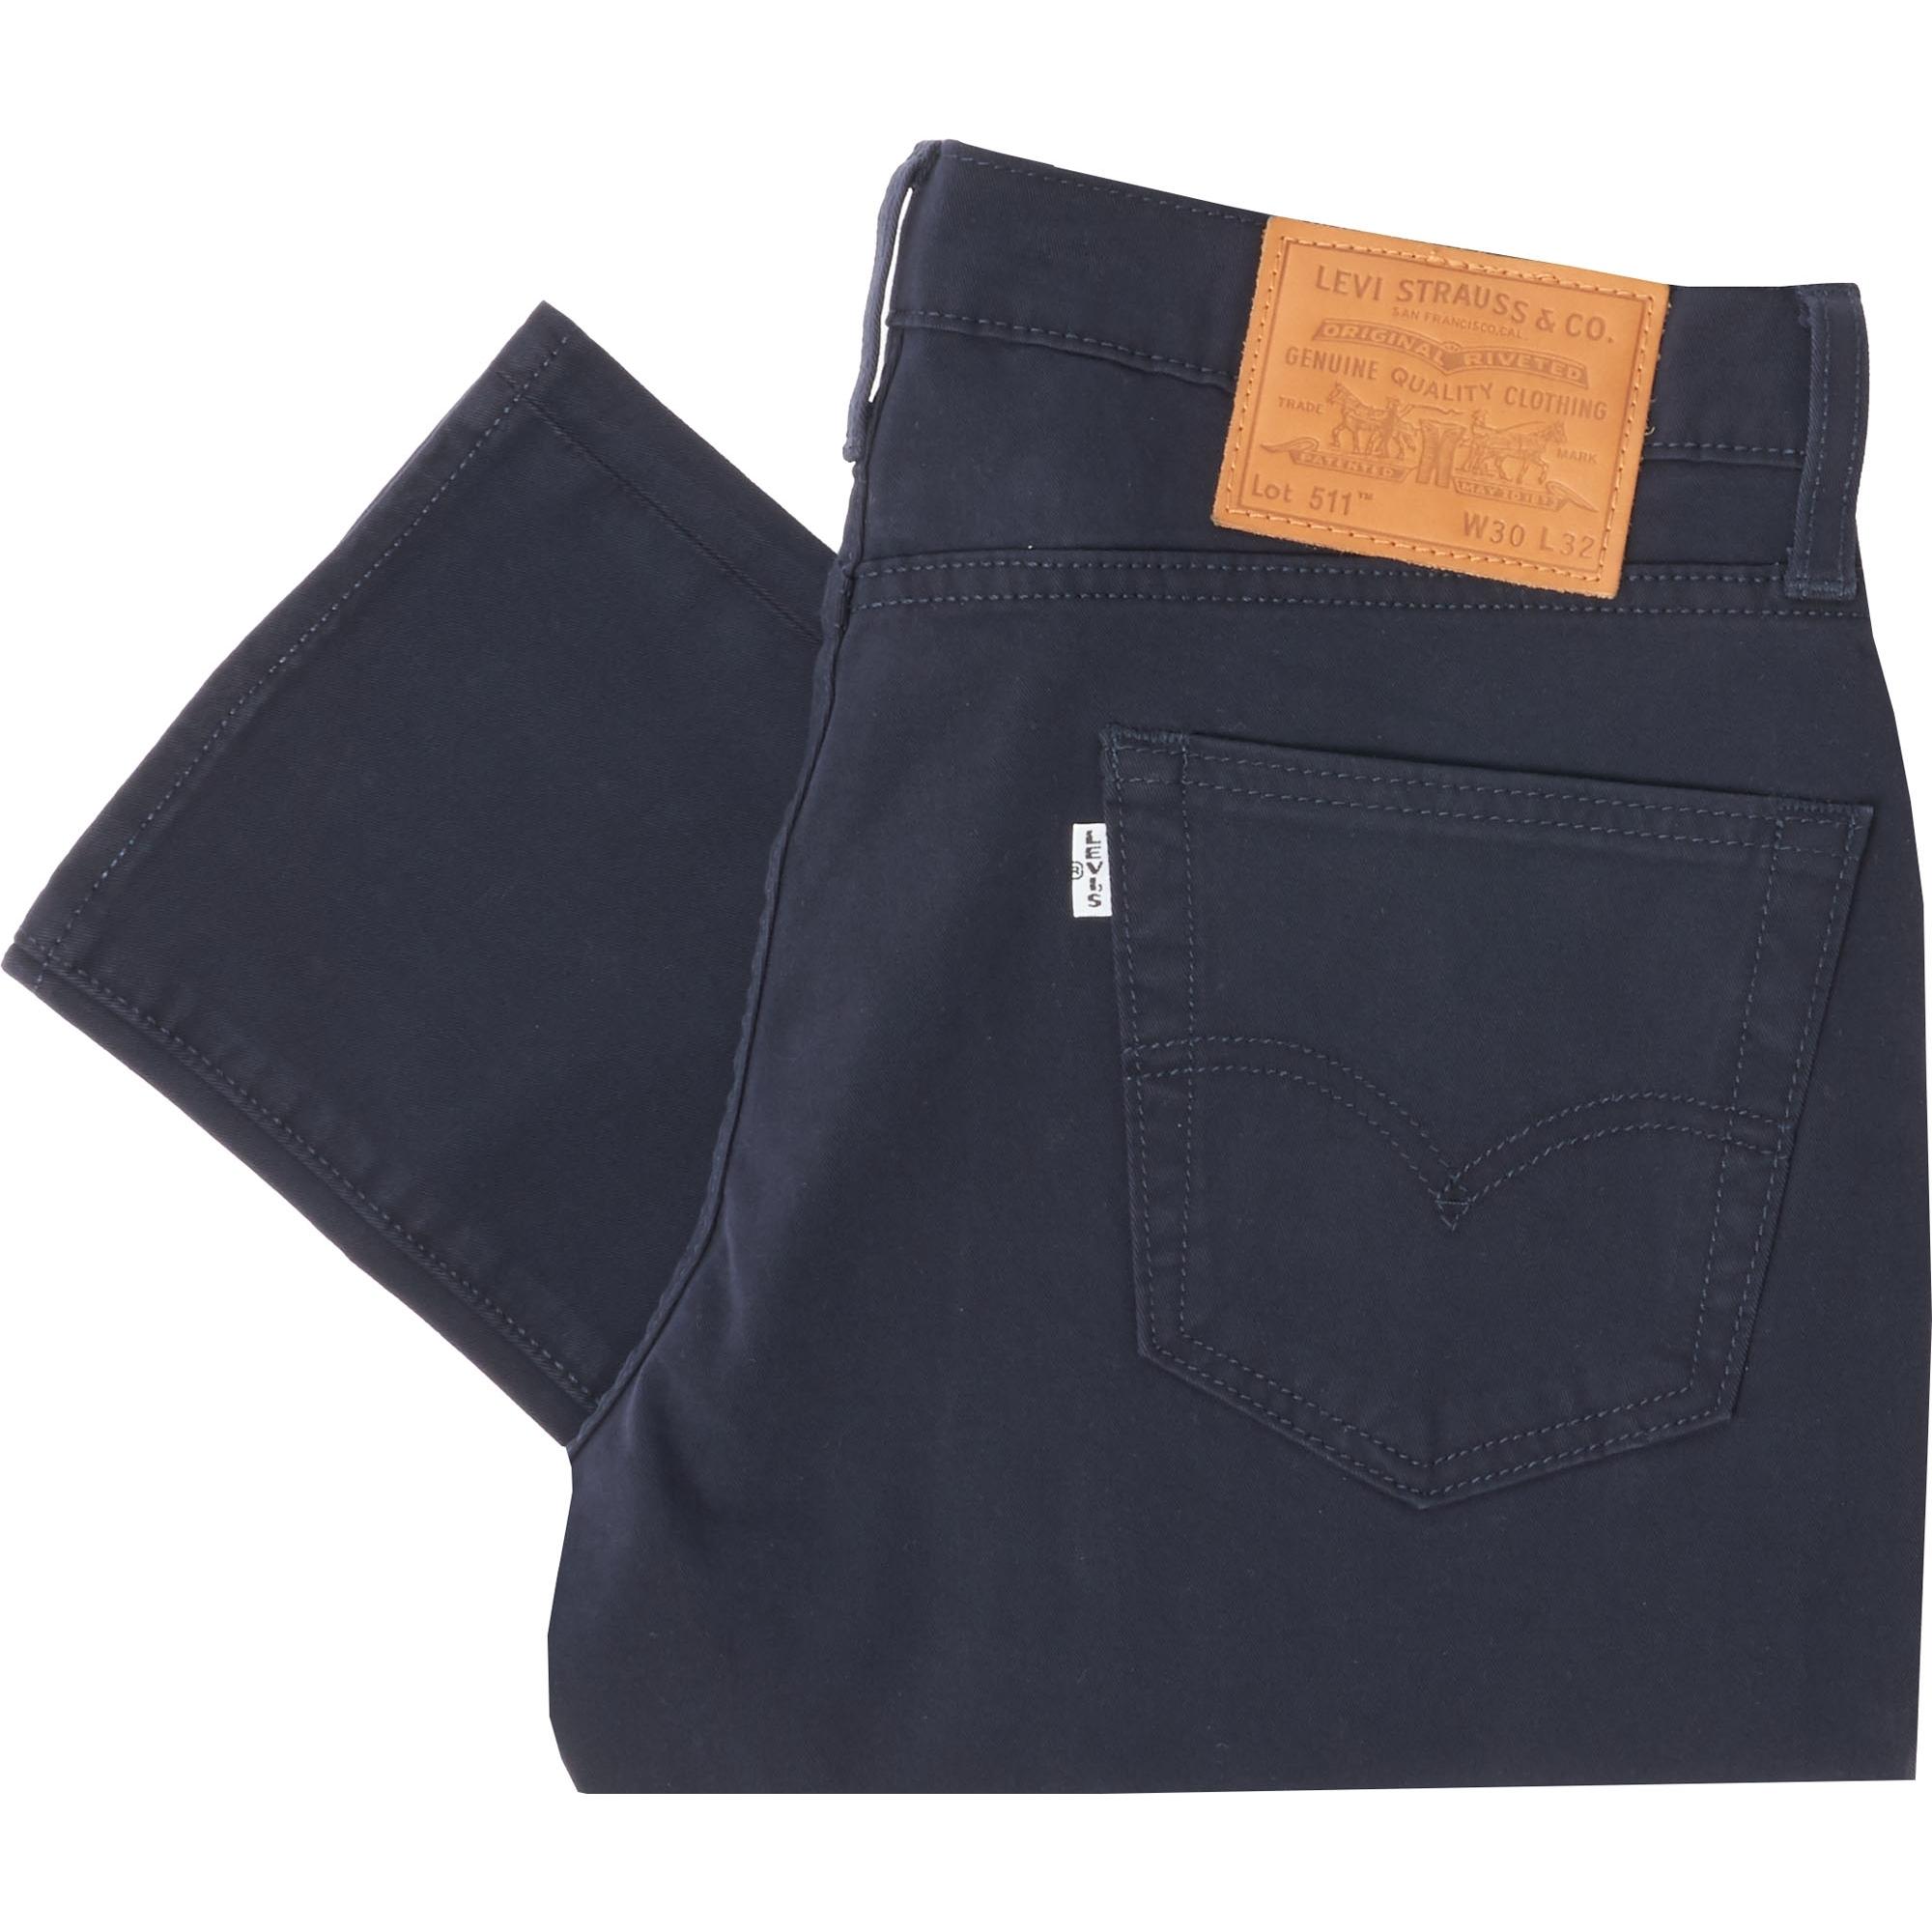 657324e415db 511 Slim Fit Jeans - Nightwatch Blue